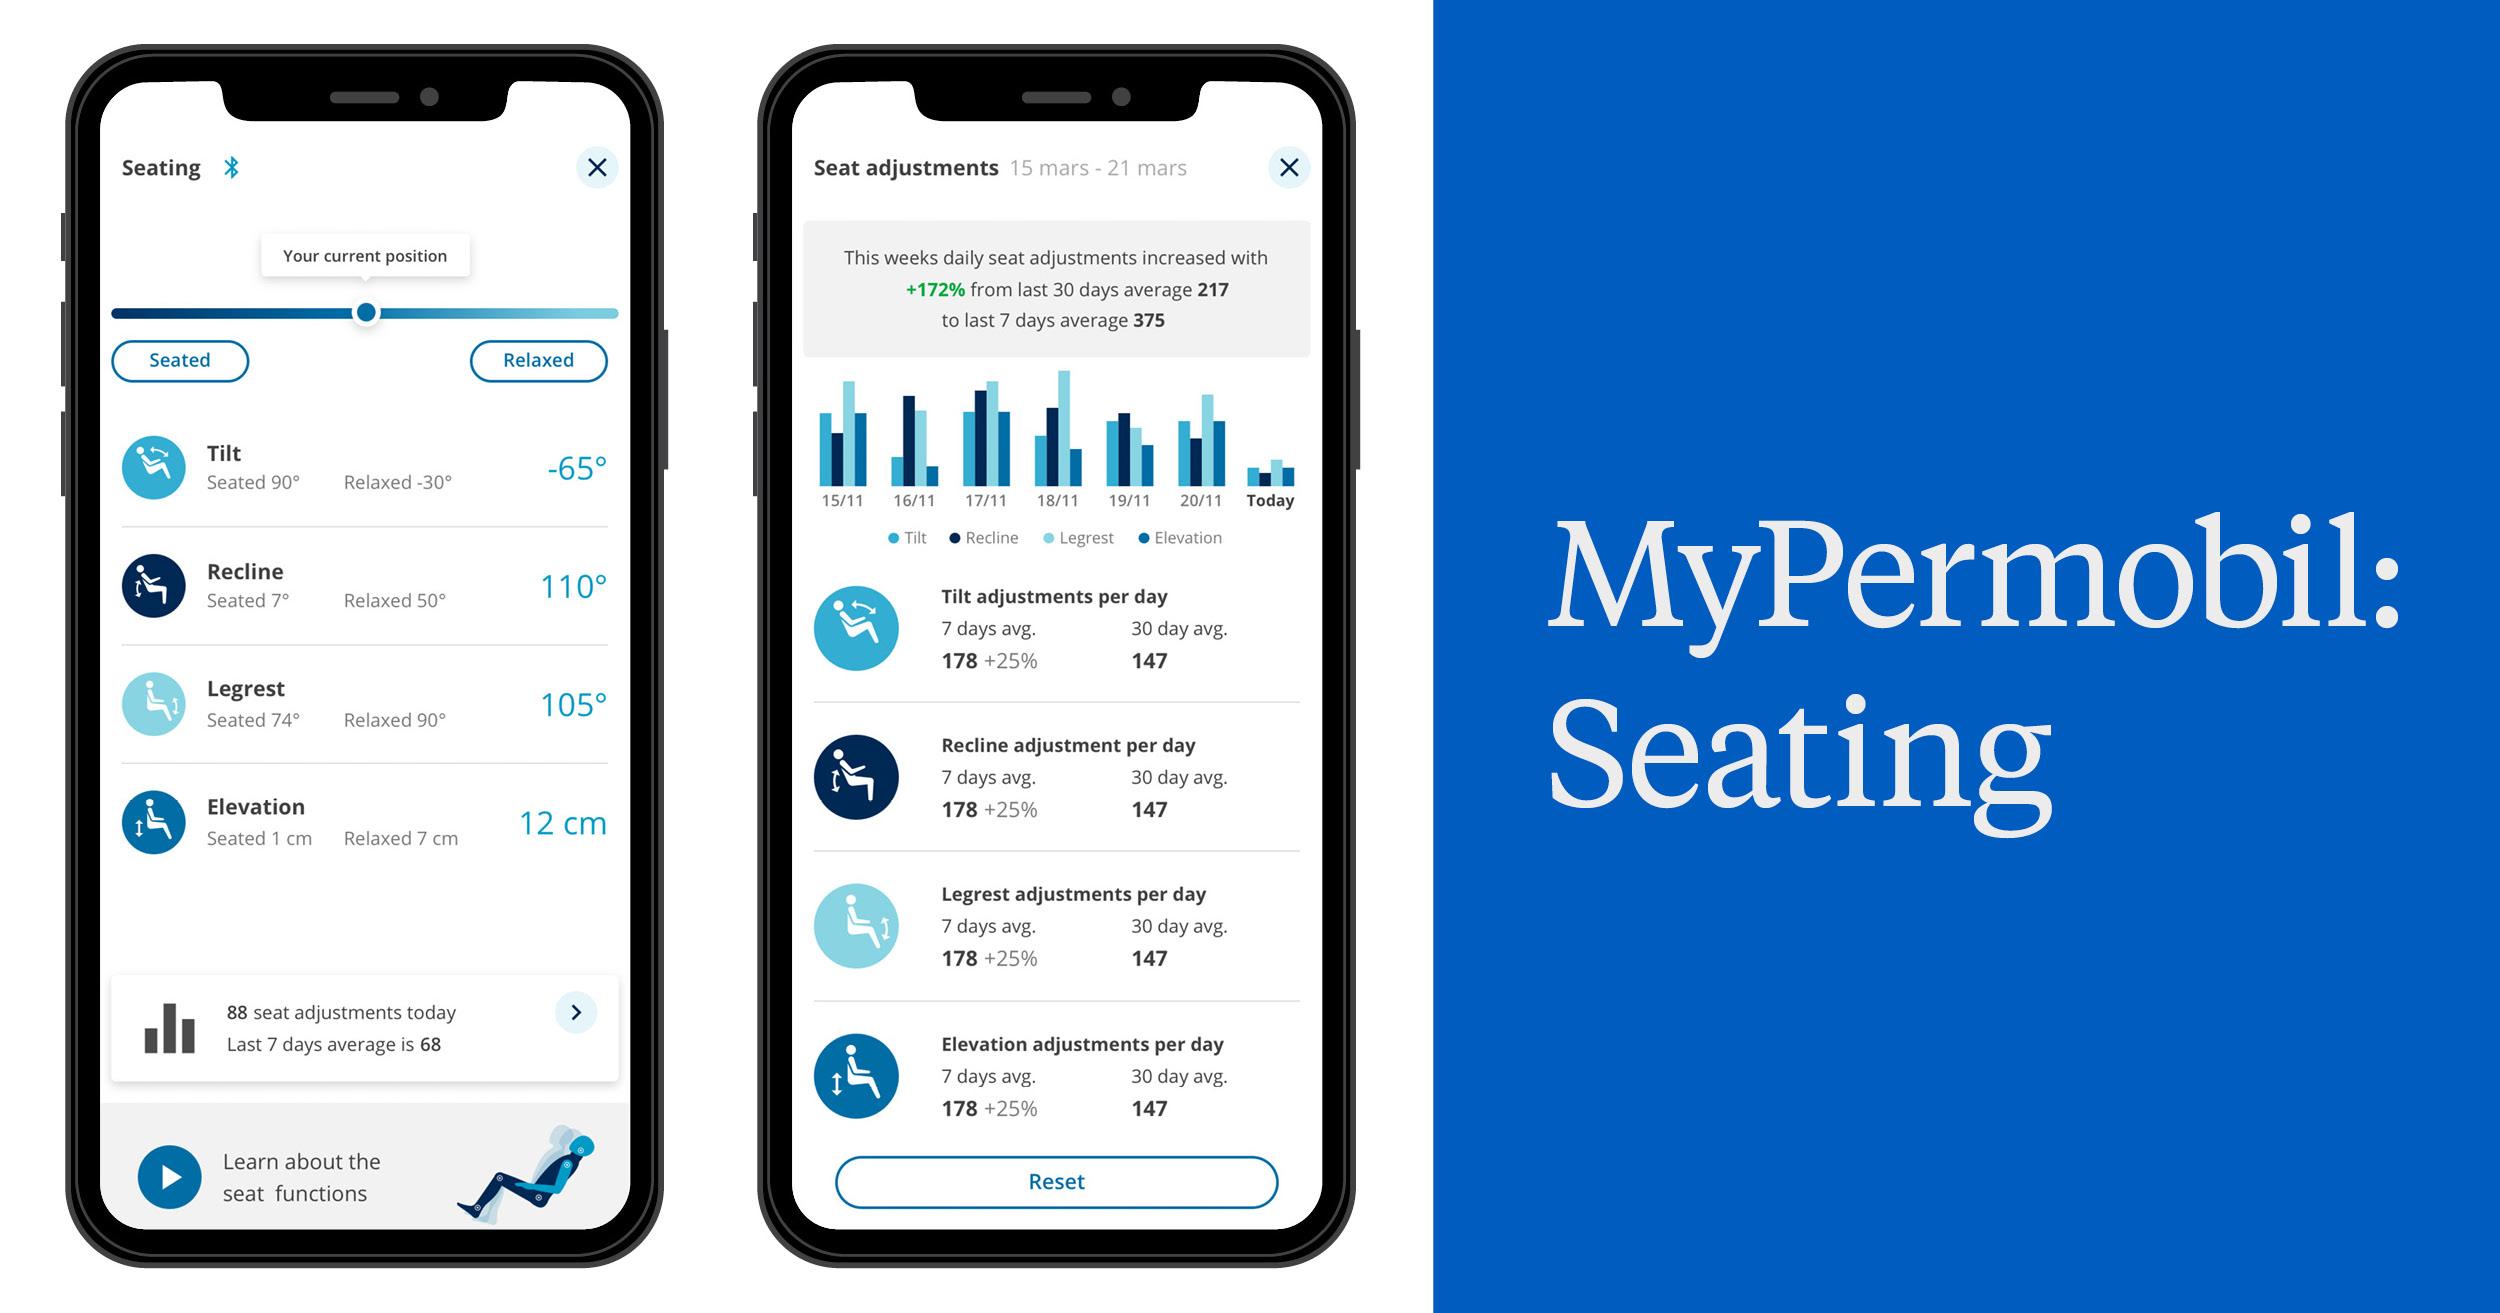 MyPermobil: Seating